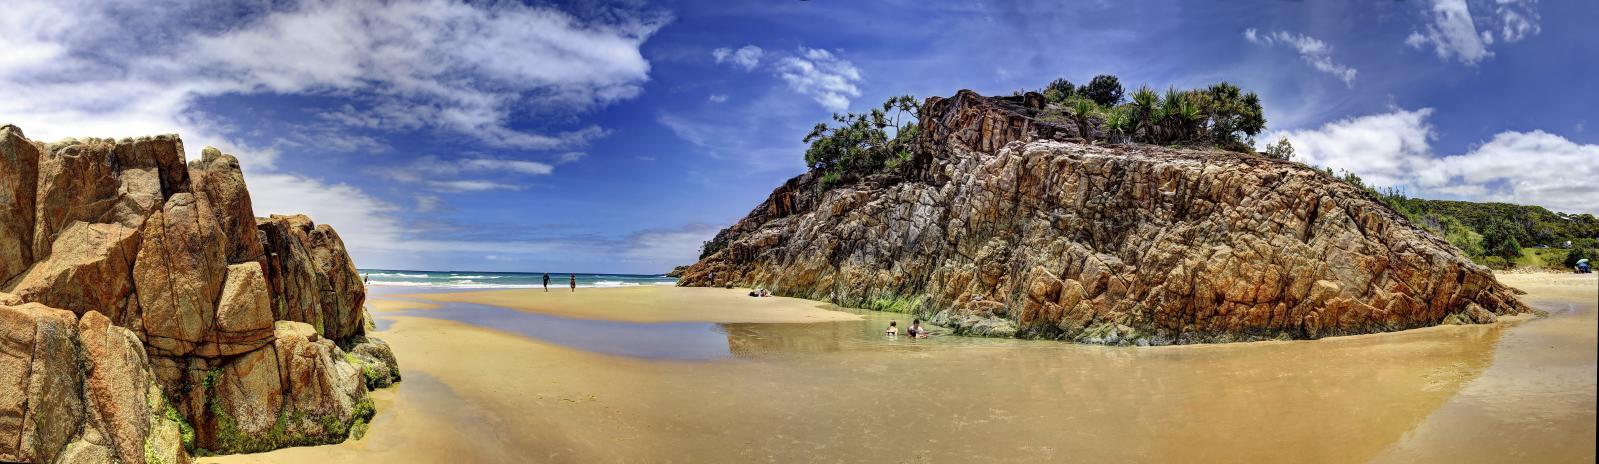 South West Rocks Australia  city photos : ... National Park, at South West Rocks, New South Wales Australia